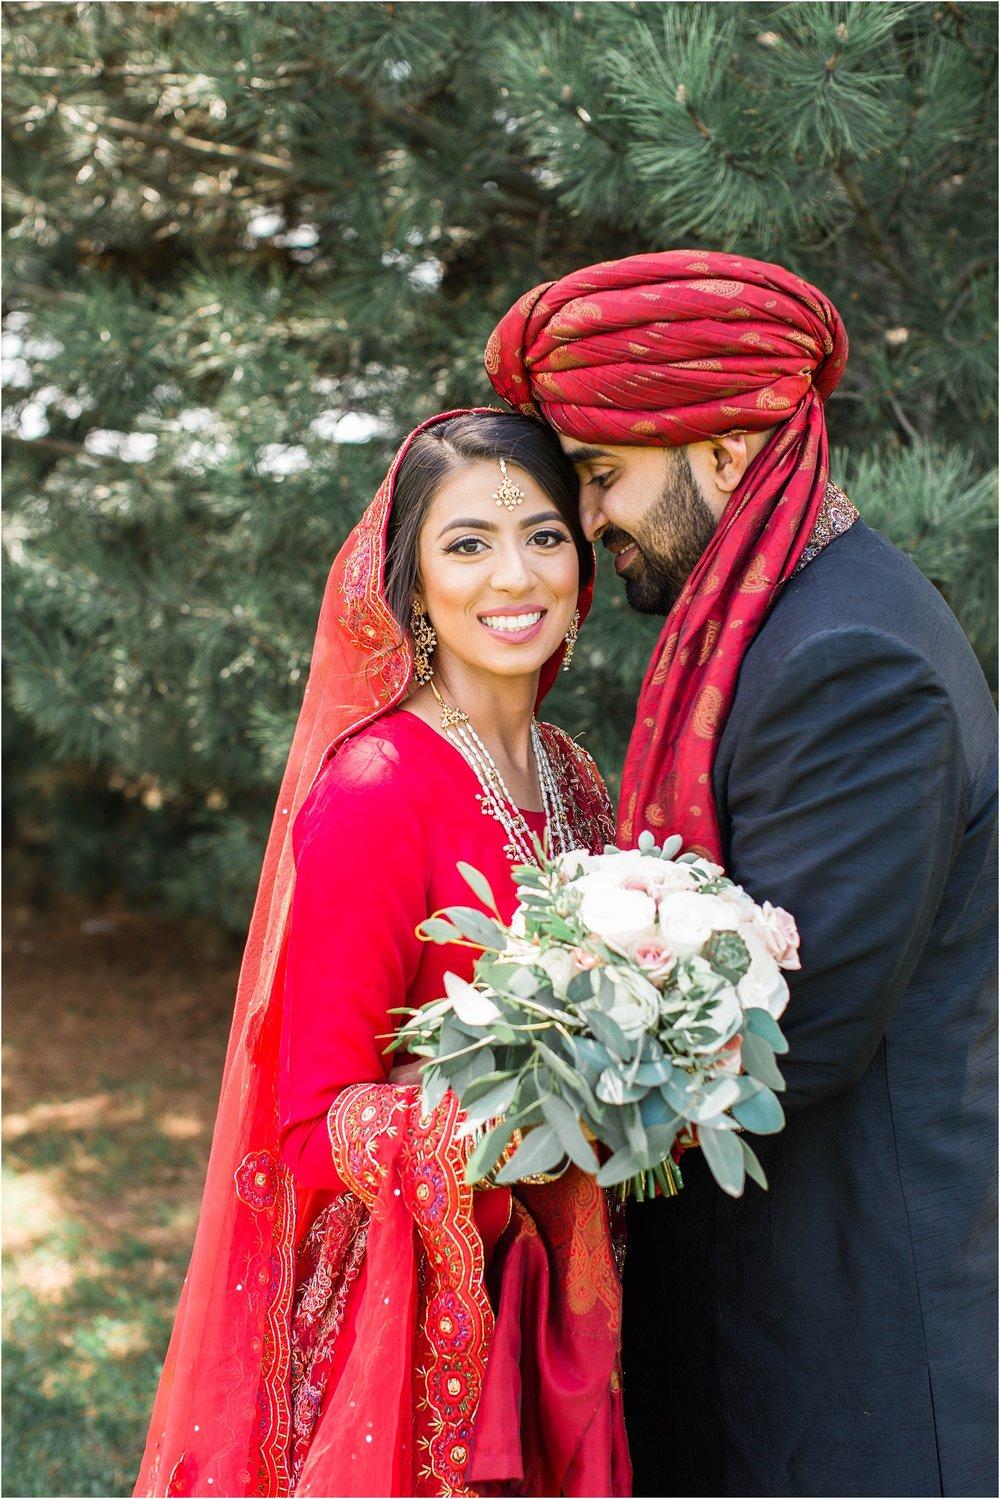 Jame-Masjid-Coopers-Mosque-Kariya-Park-Cherry-Blossoms-Wedding-Toronto-Mississauga-Brampton-Scarborough-GTA-Pakistani-Indian-Wedding-Engagement-Photographer-Photography_0017.jpg